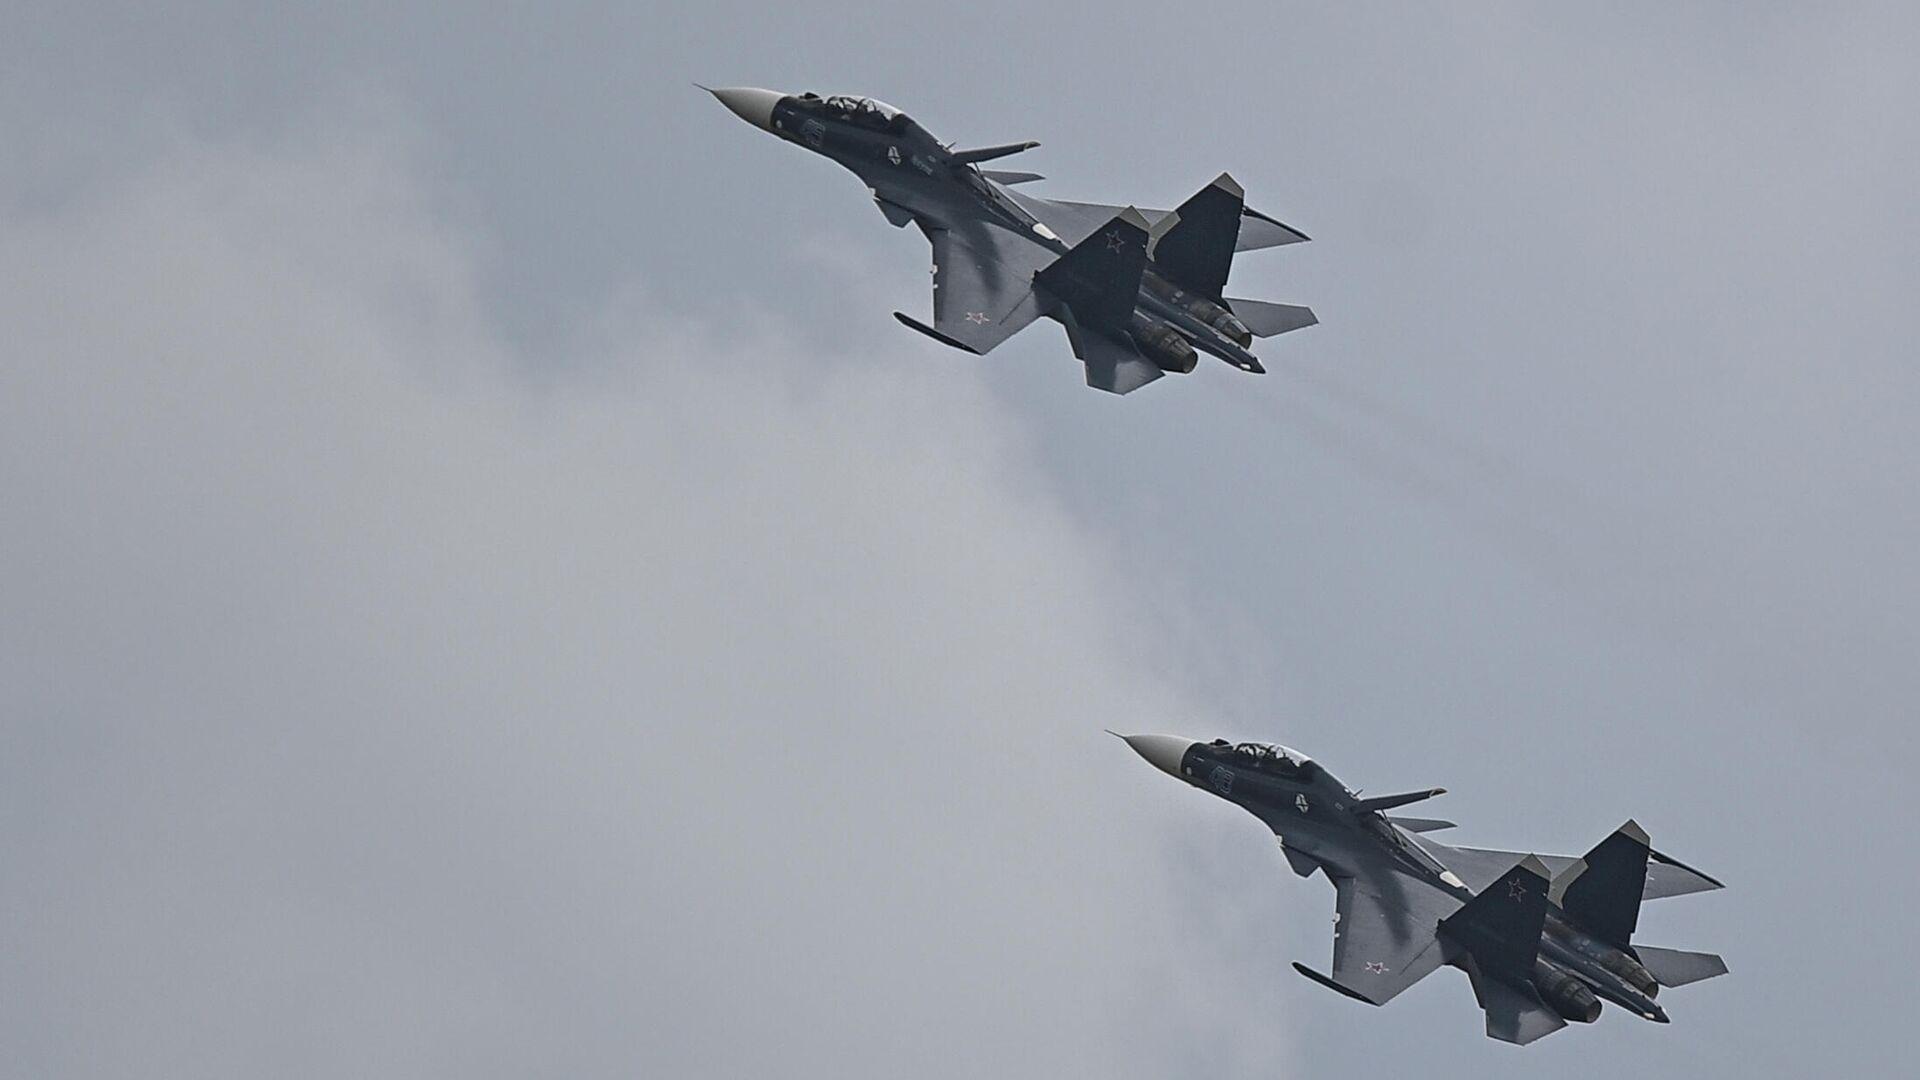 Истребители Су-30СМ  - РИА Новости, 1920, 10.09.2021